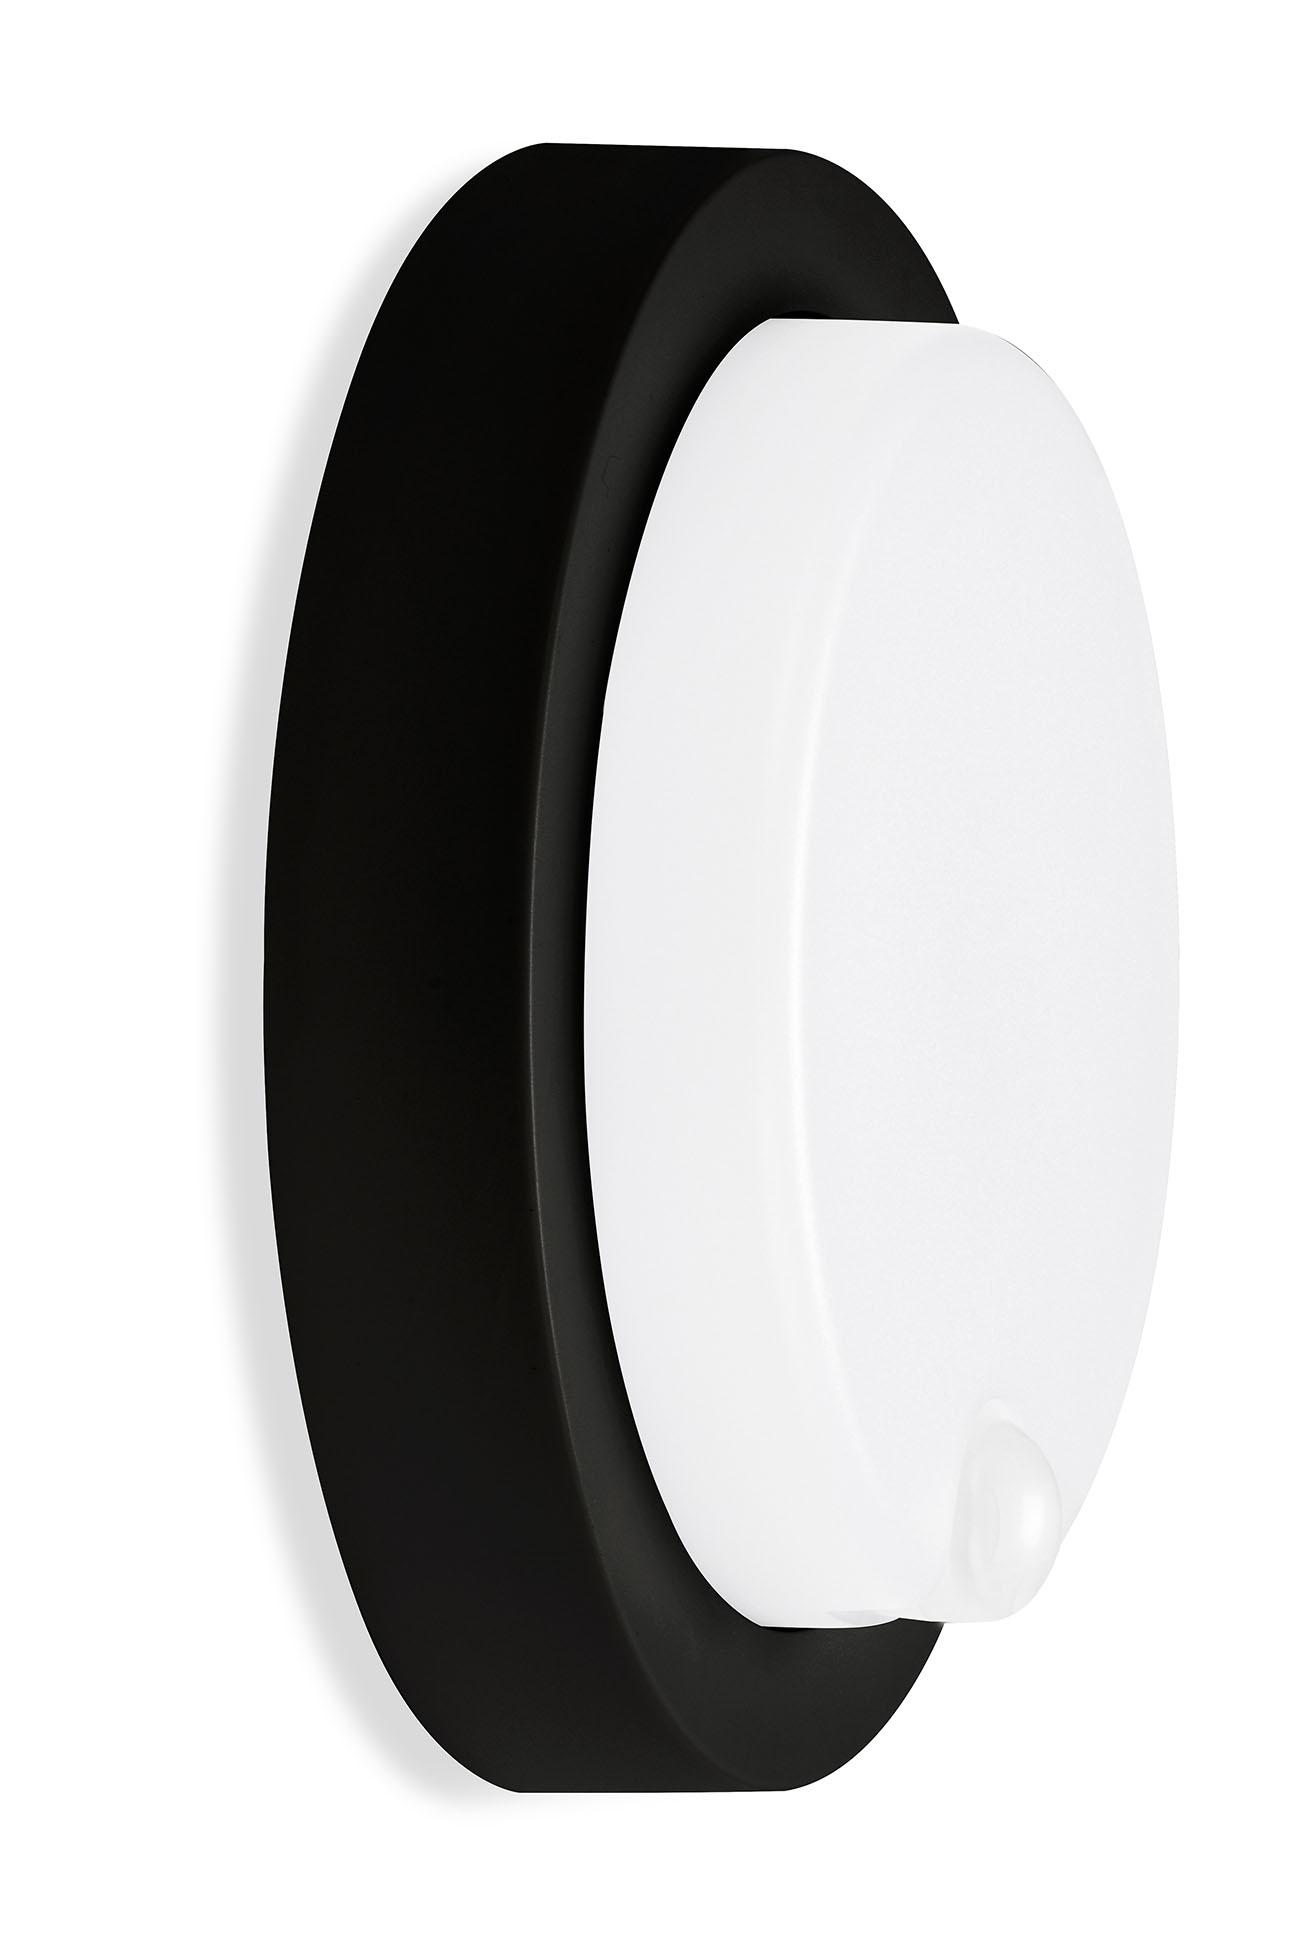 TELEFUNKEN LED Sensor Aussenwandleuchte, Ø 17 cm, 12 W, Schwarz